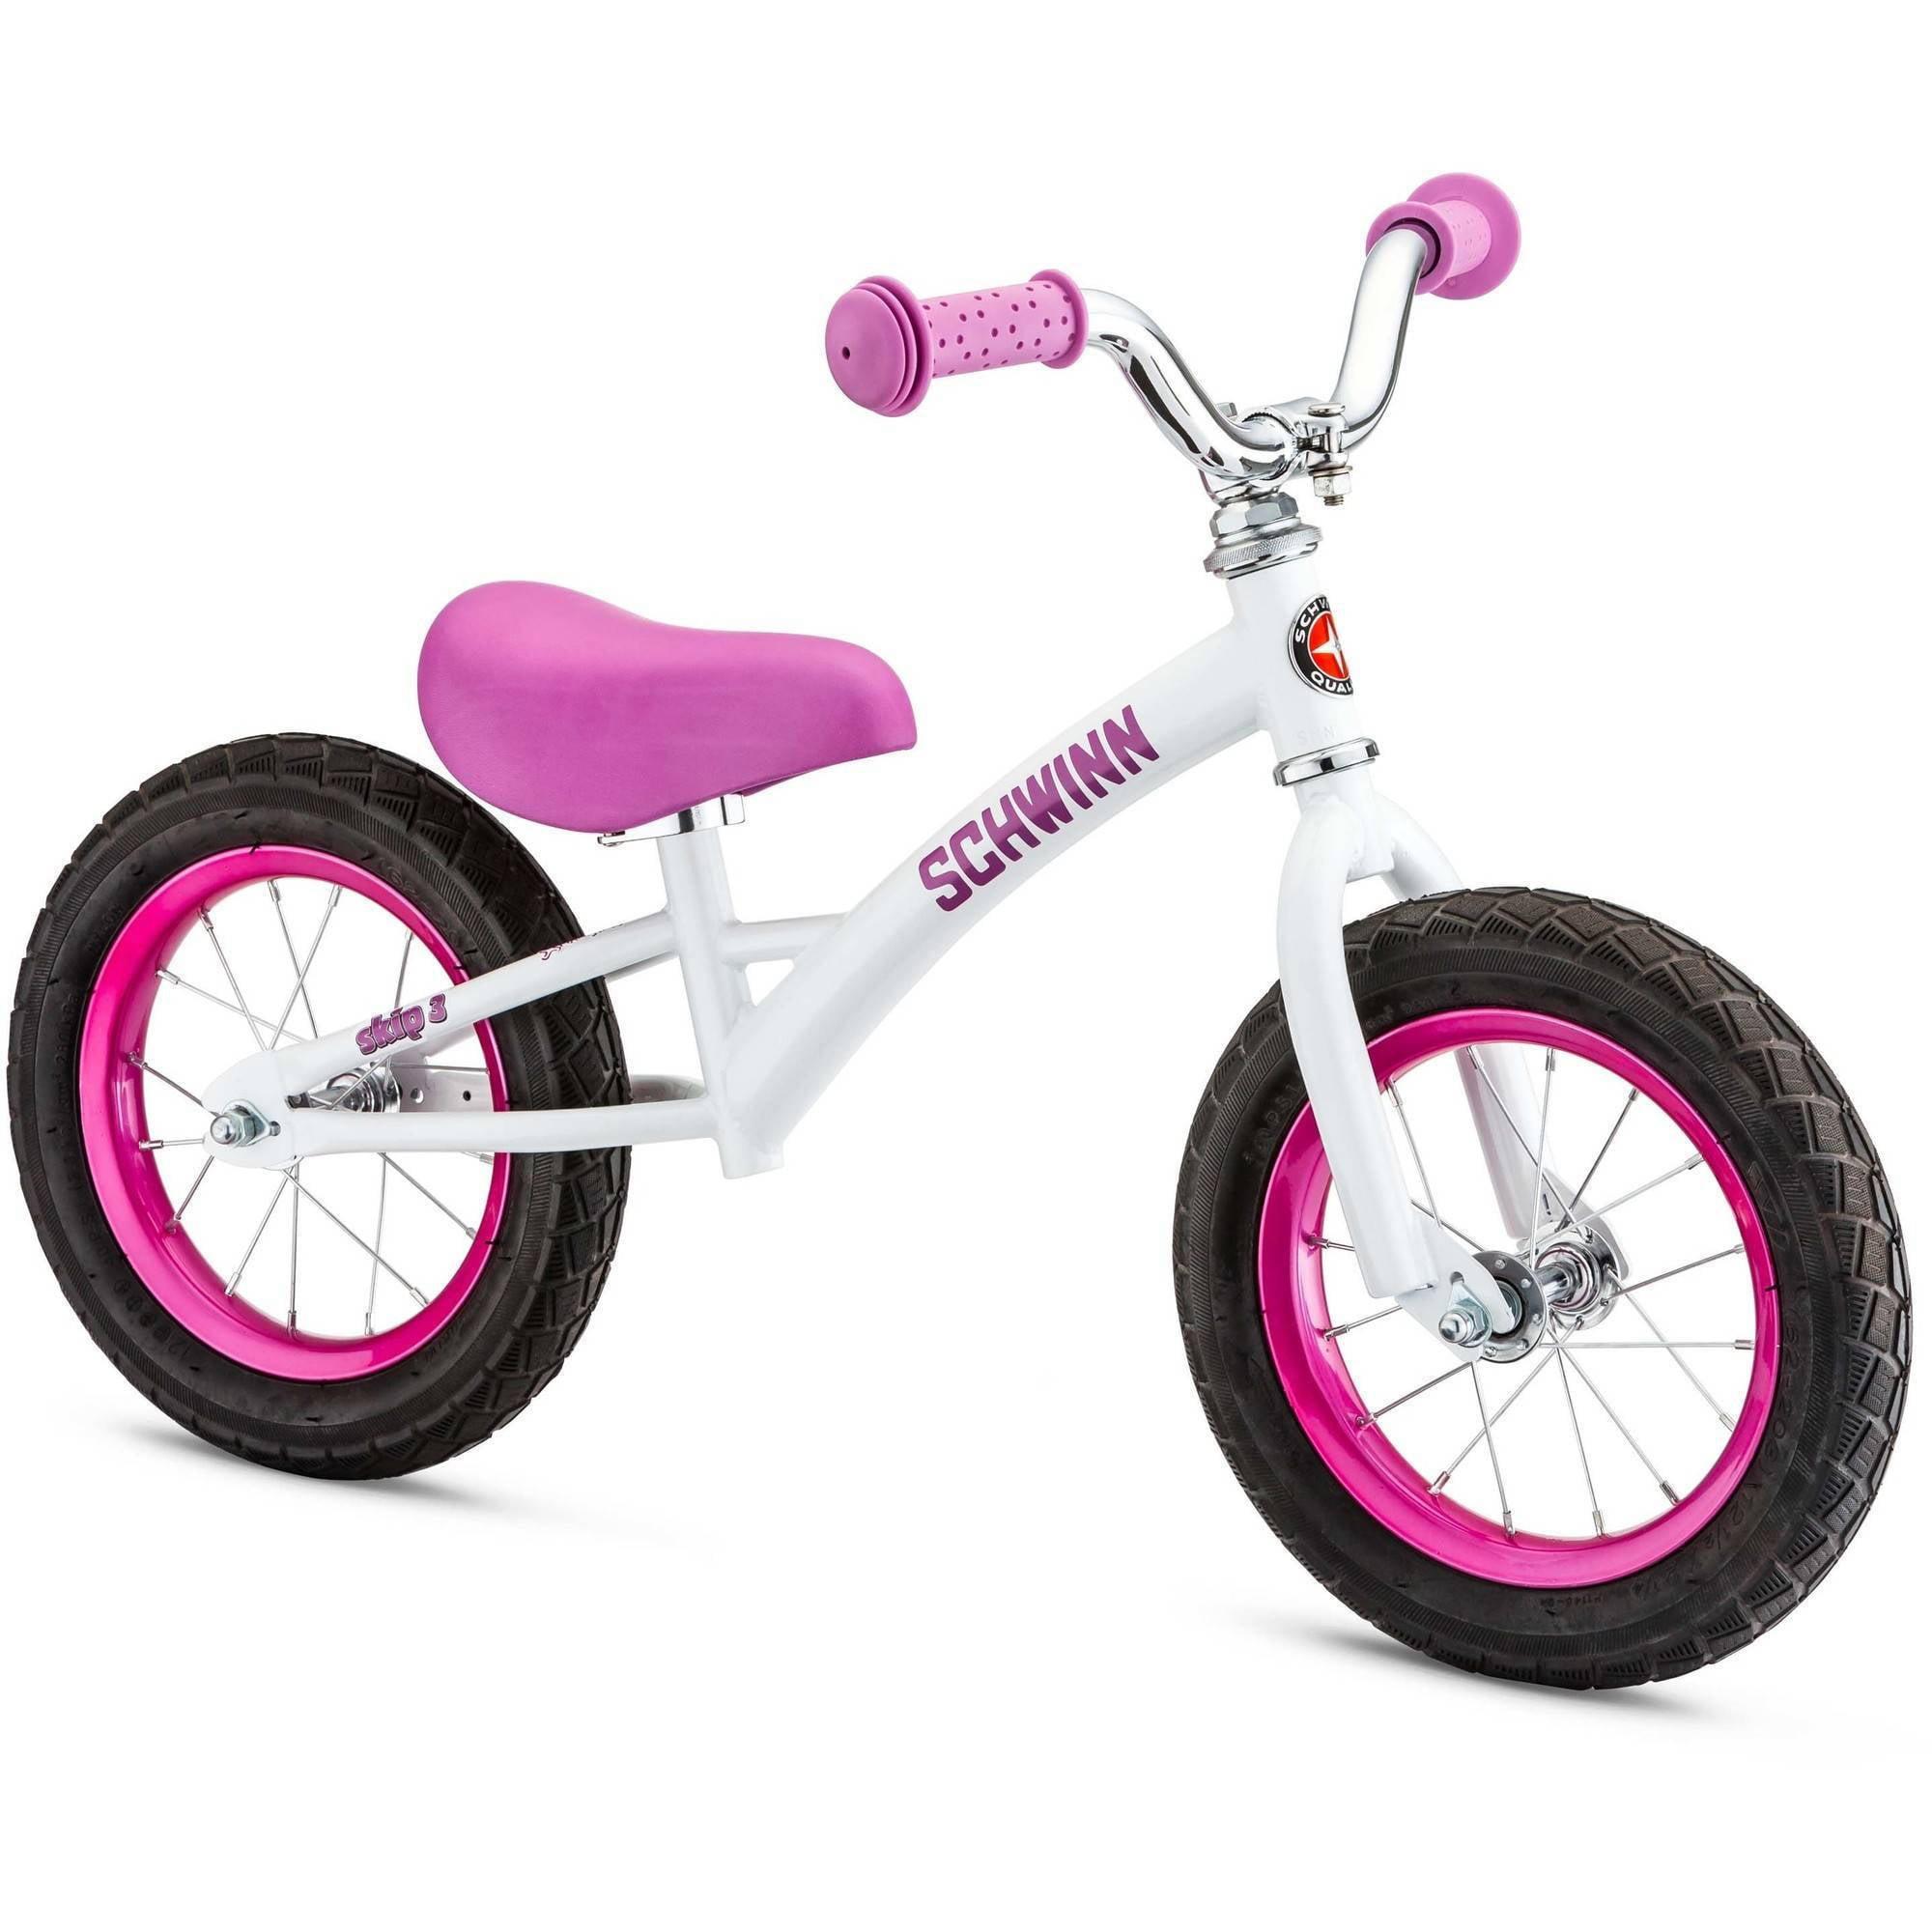 Bicicleta Para Niño(A) Schwinn Skip 3 Balance Bike, blanco + Schwinn en Veo y Compro